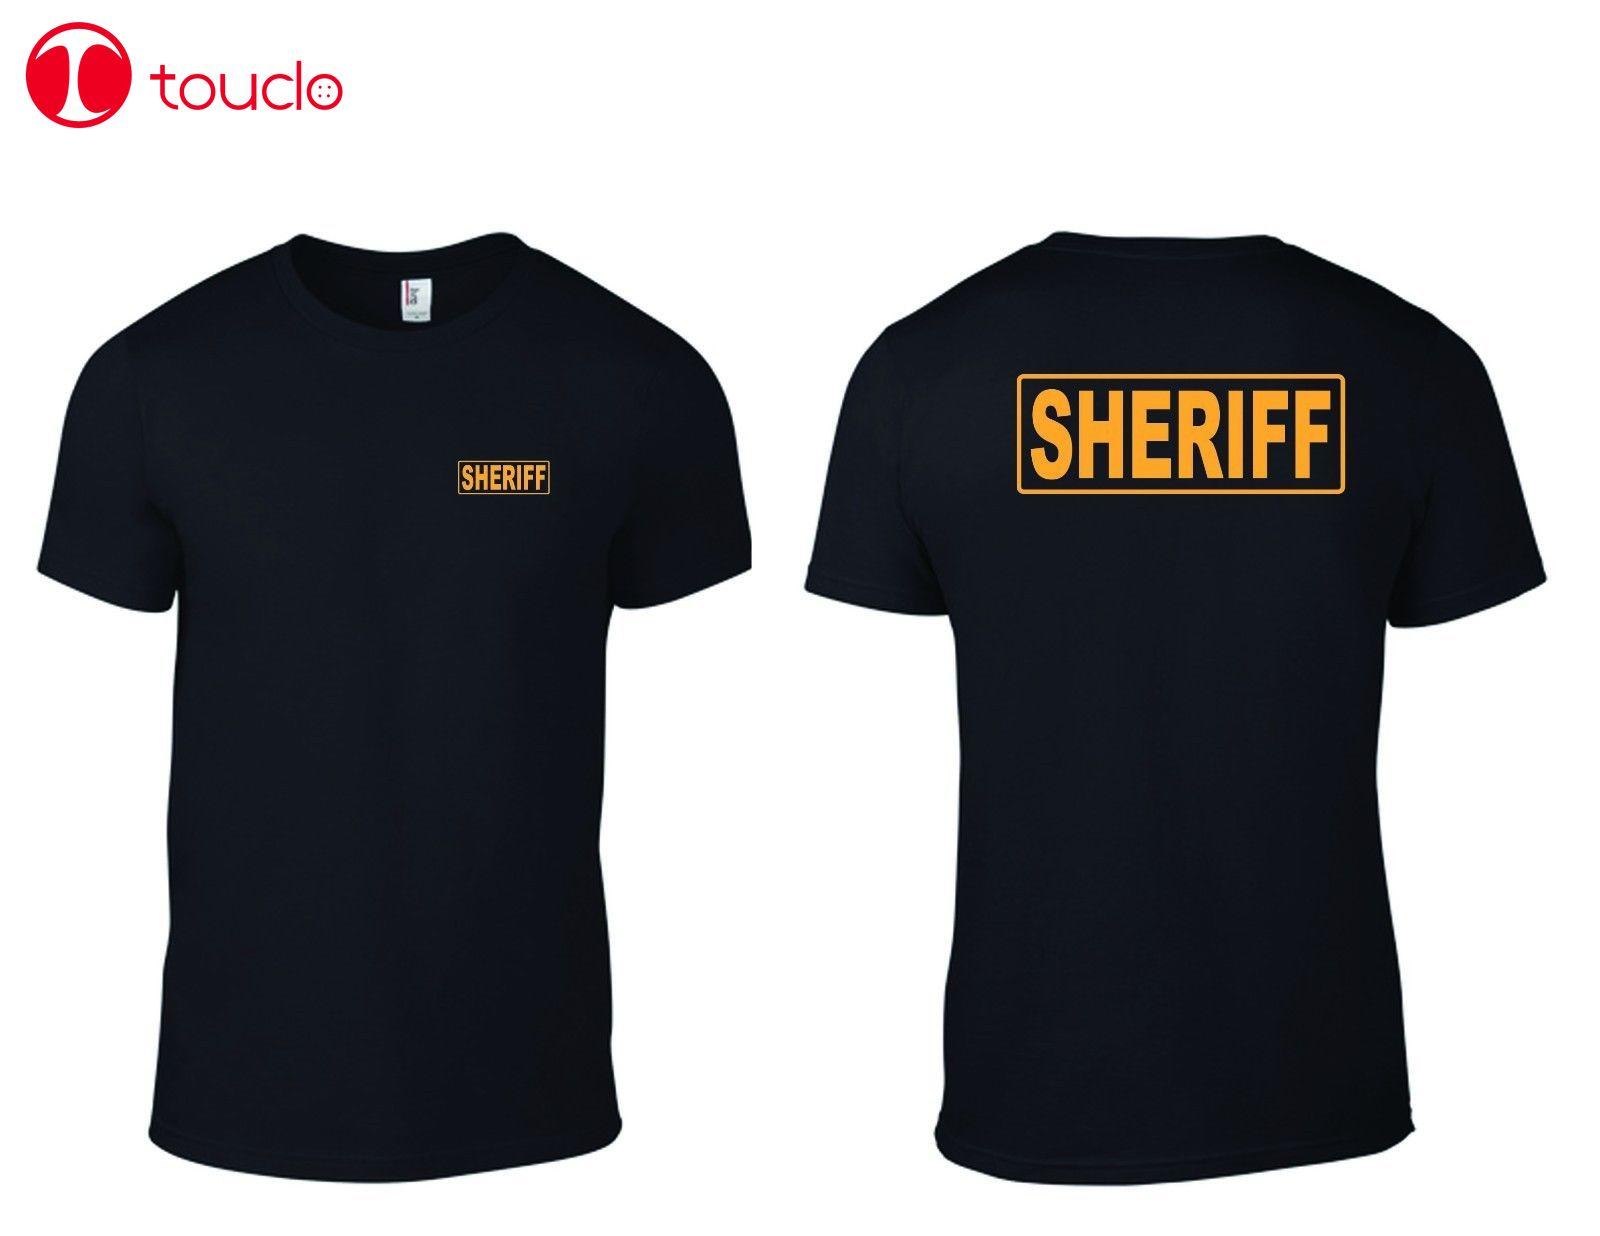 2 Side 2019 New Men T-Shirt Sheriff Officer T-Shirt / Law Enforcement Sheriff T-Shirts Sweater